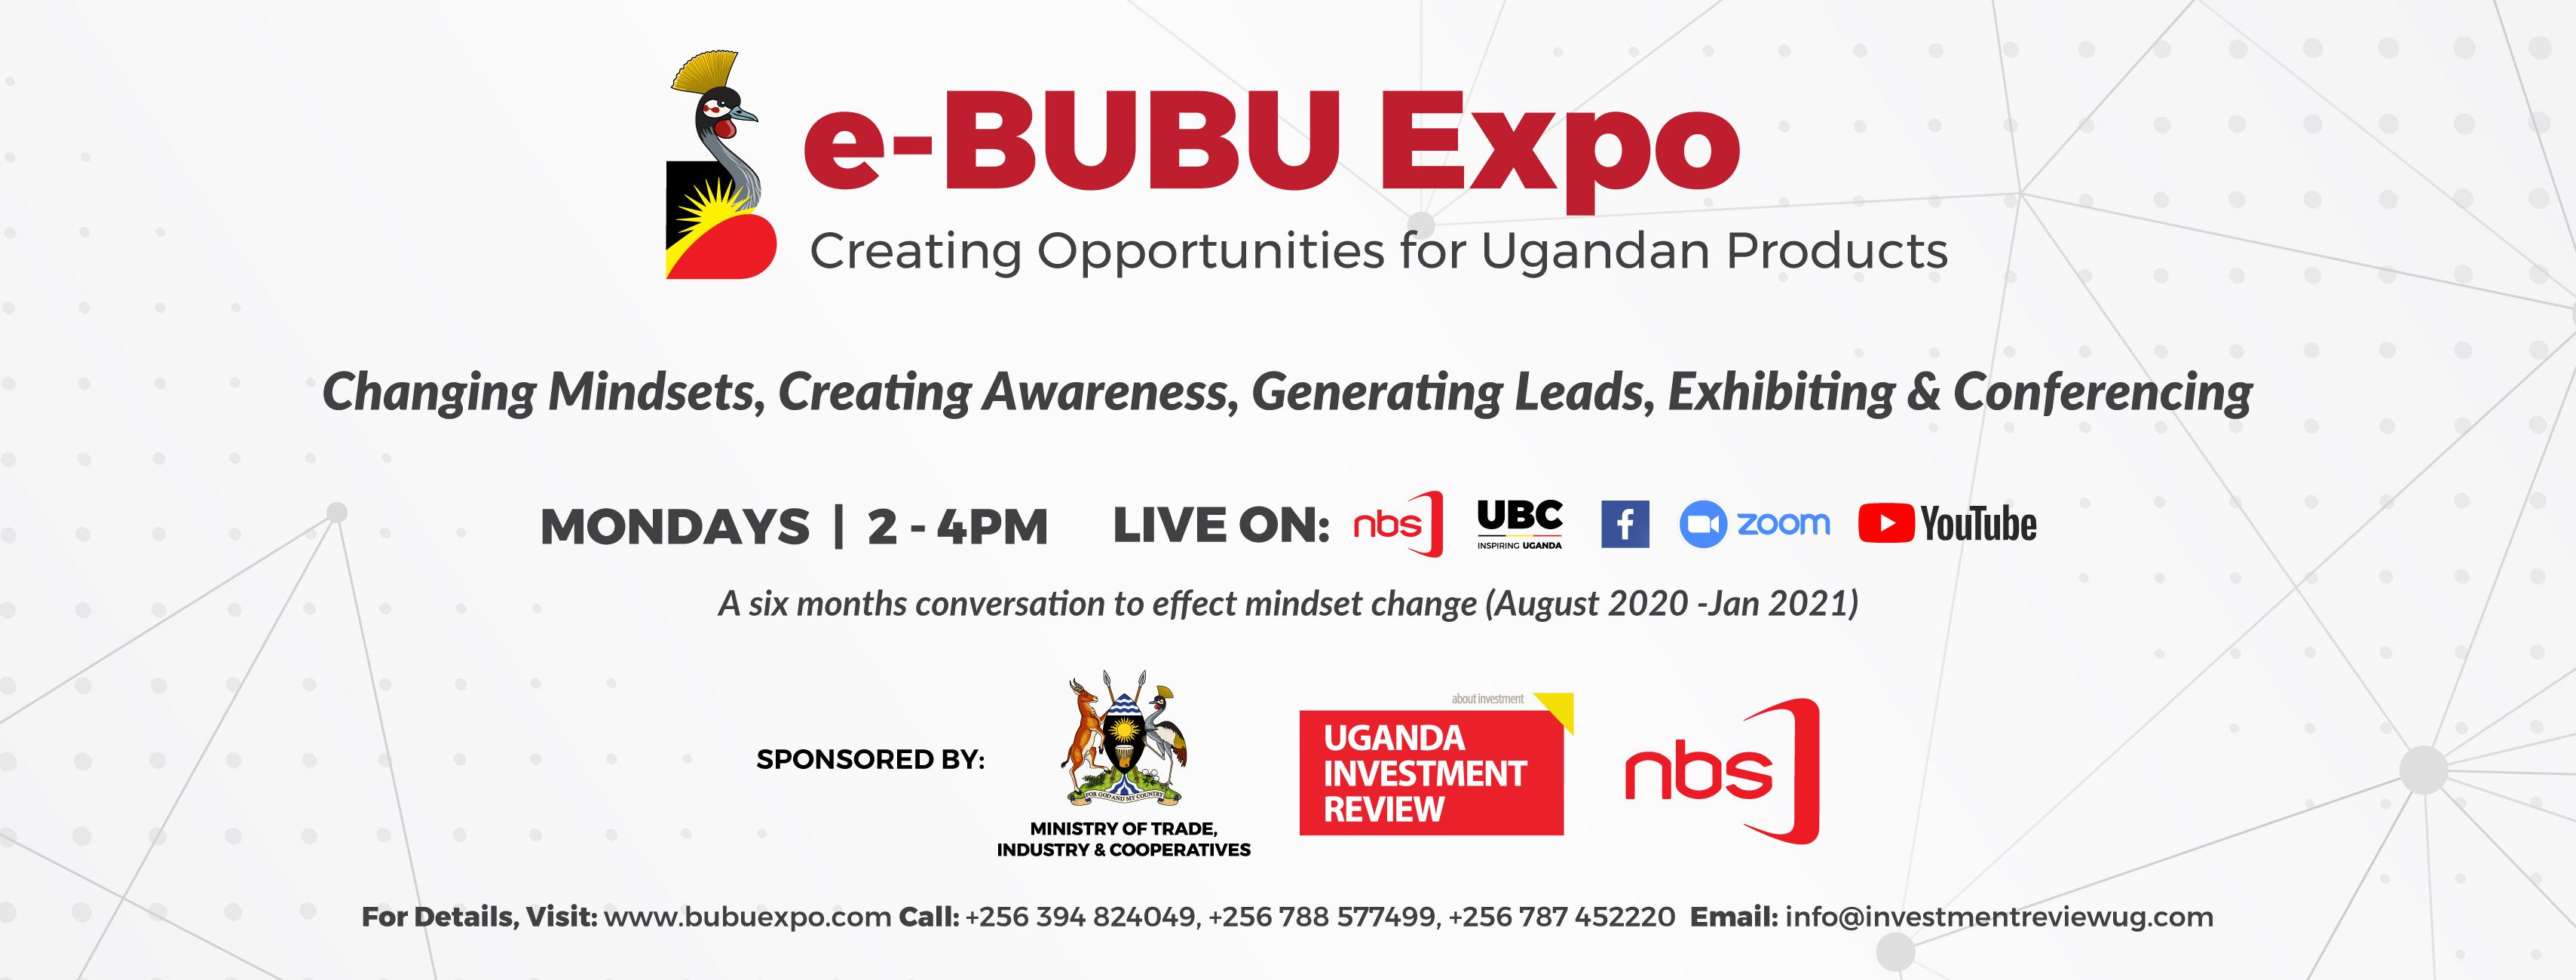 e-BUBU Expo